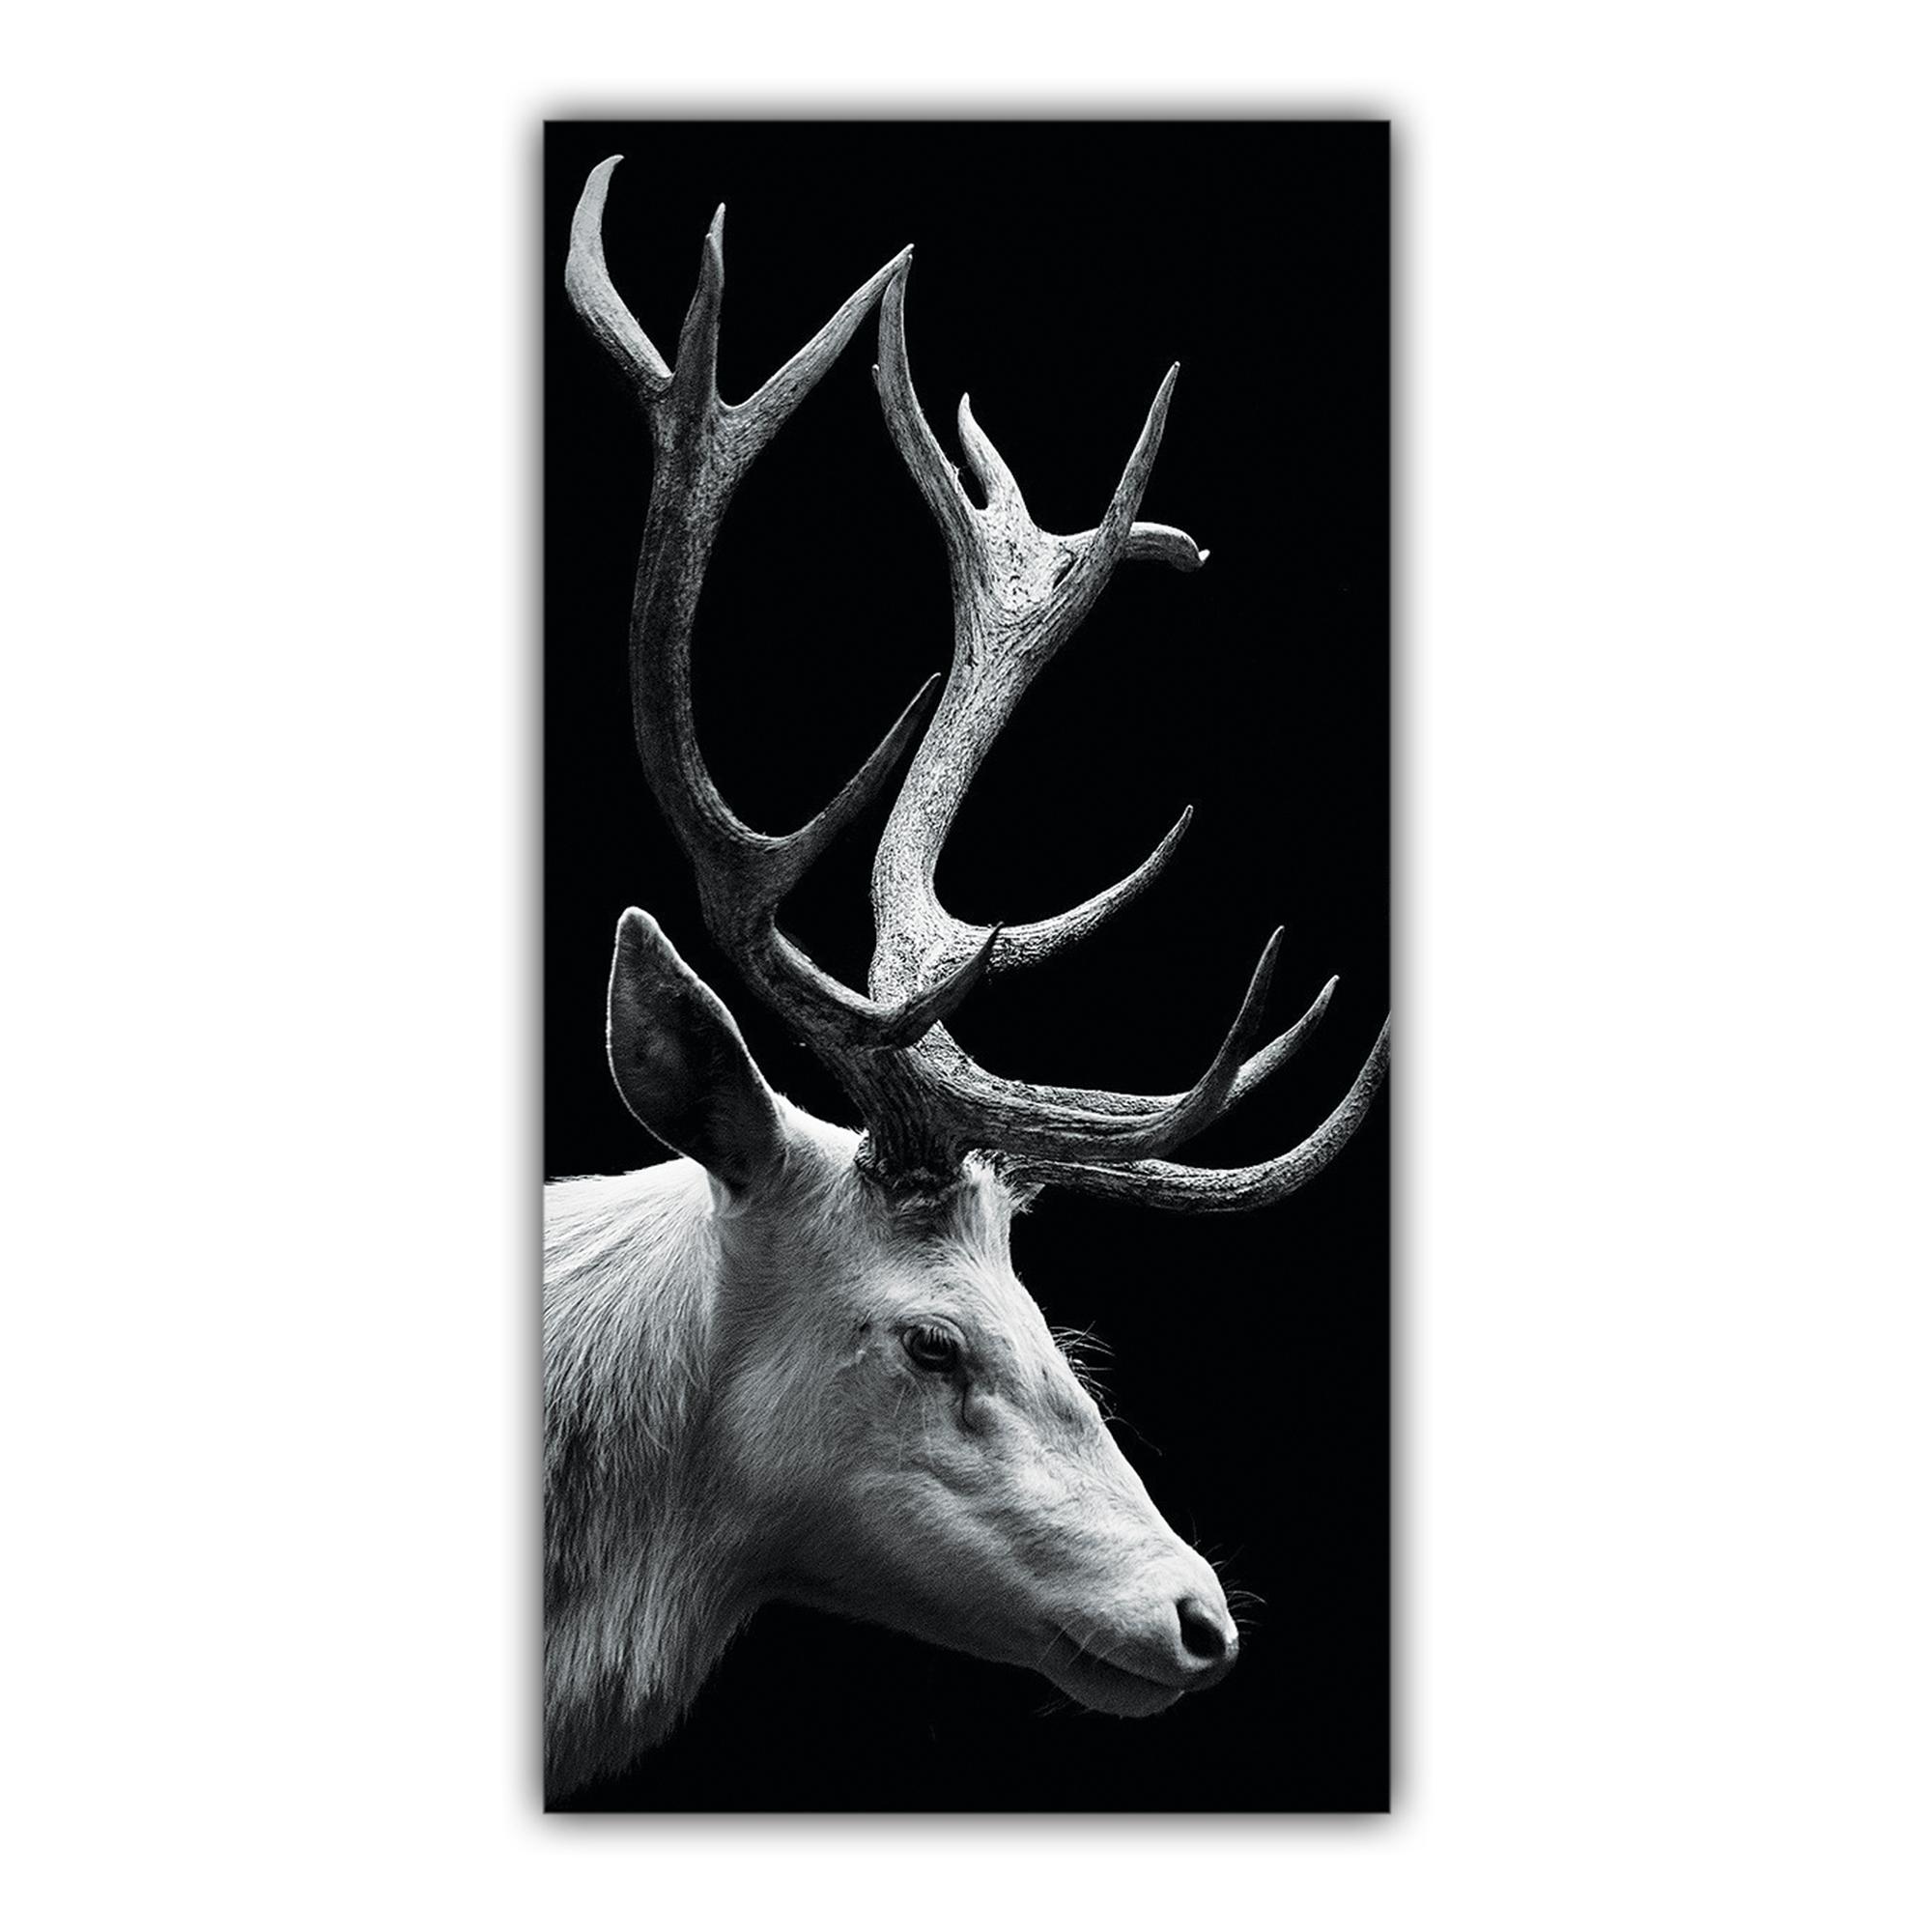 Cerf Noir et blanc